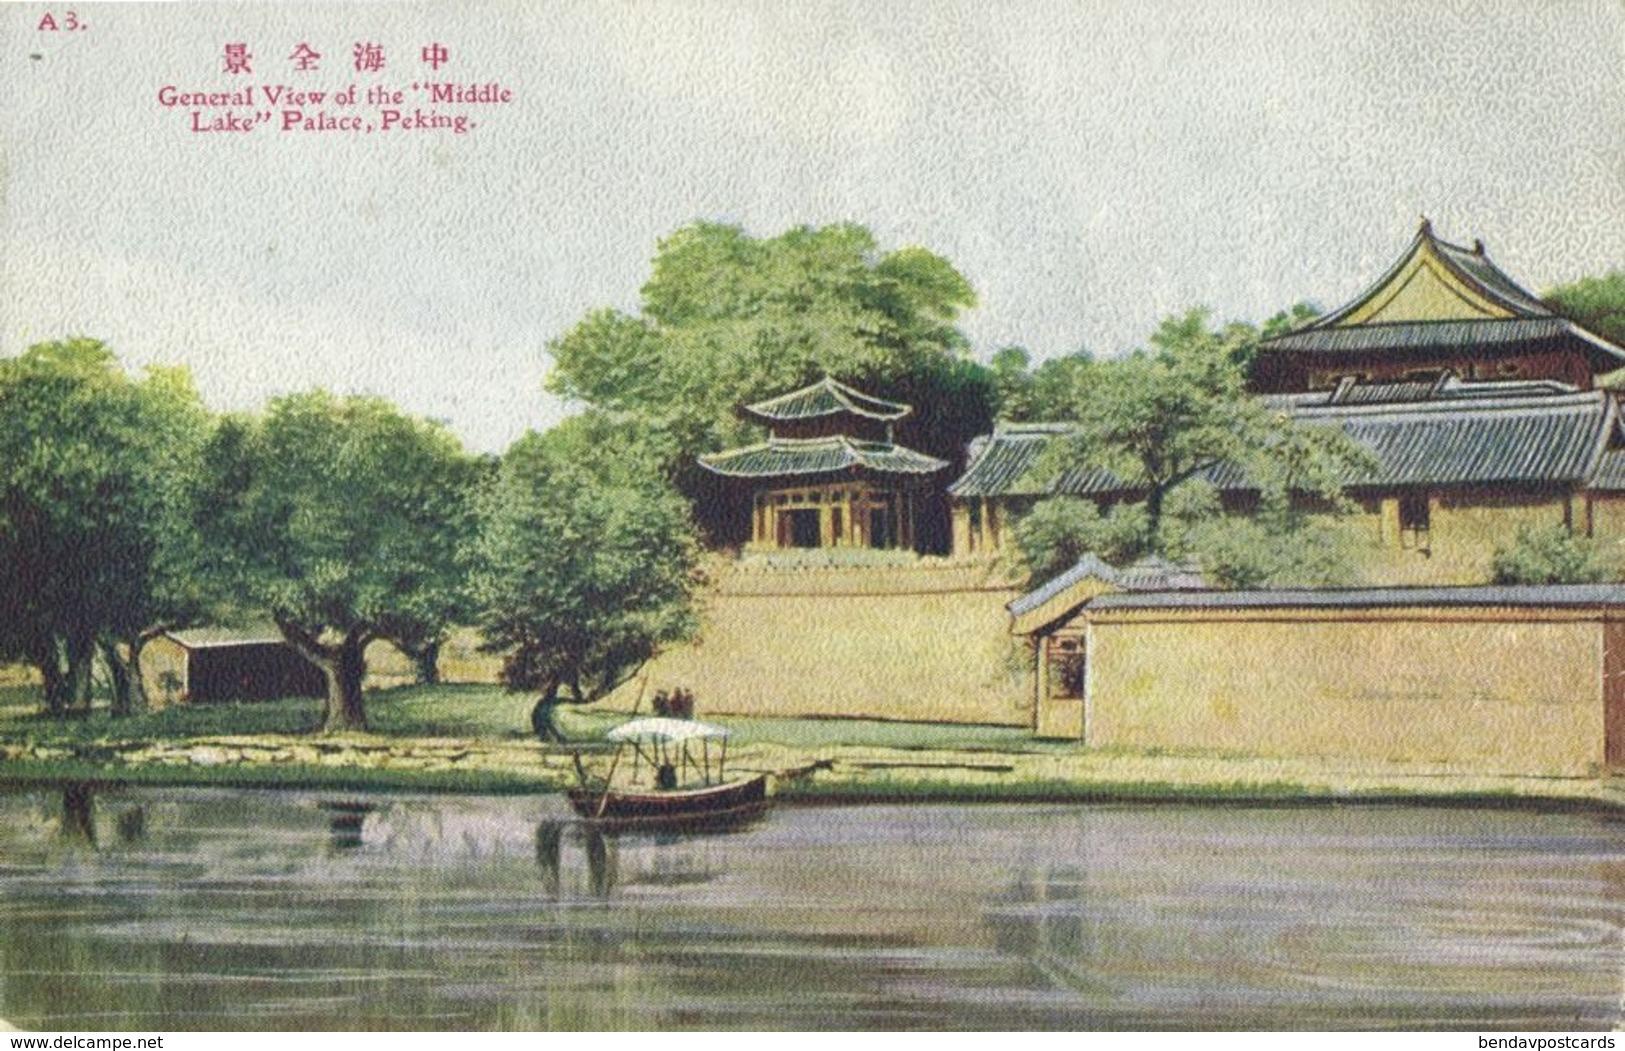 China, PEKING PEIPING, General View Middle Lake Palace (1910s) Postcard - China